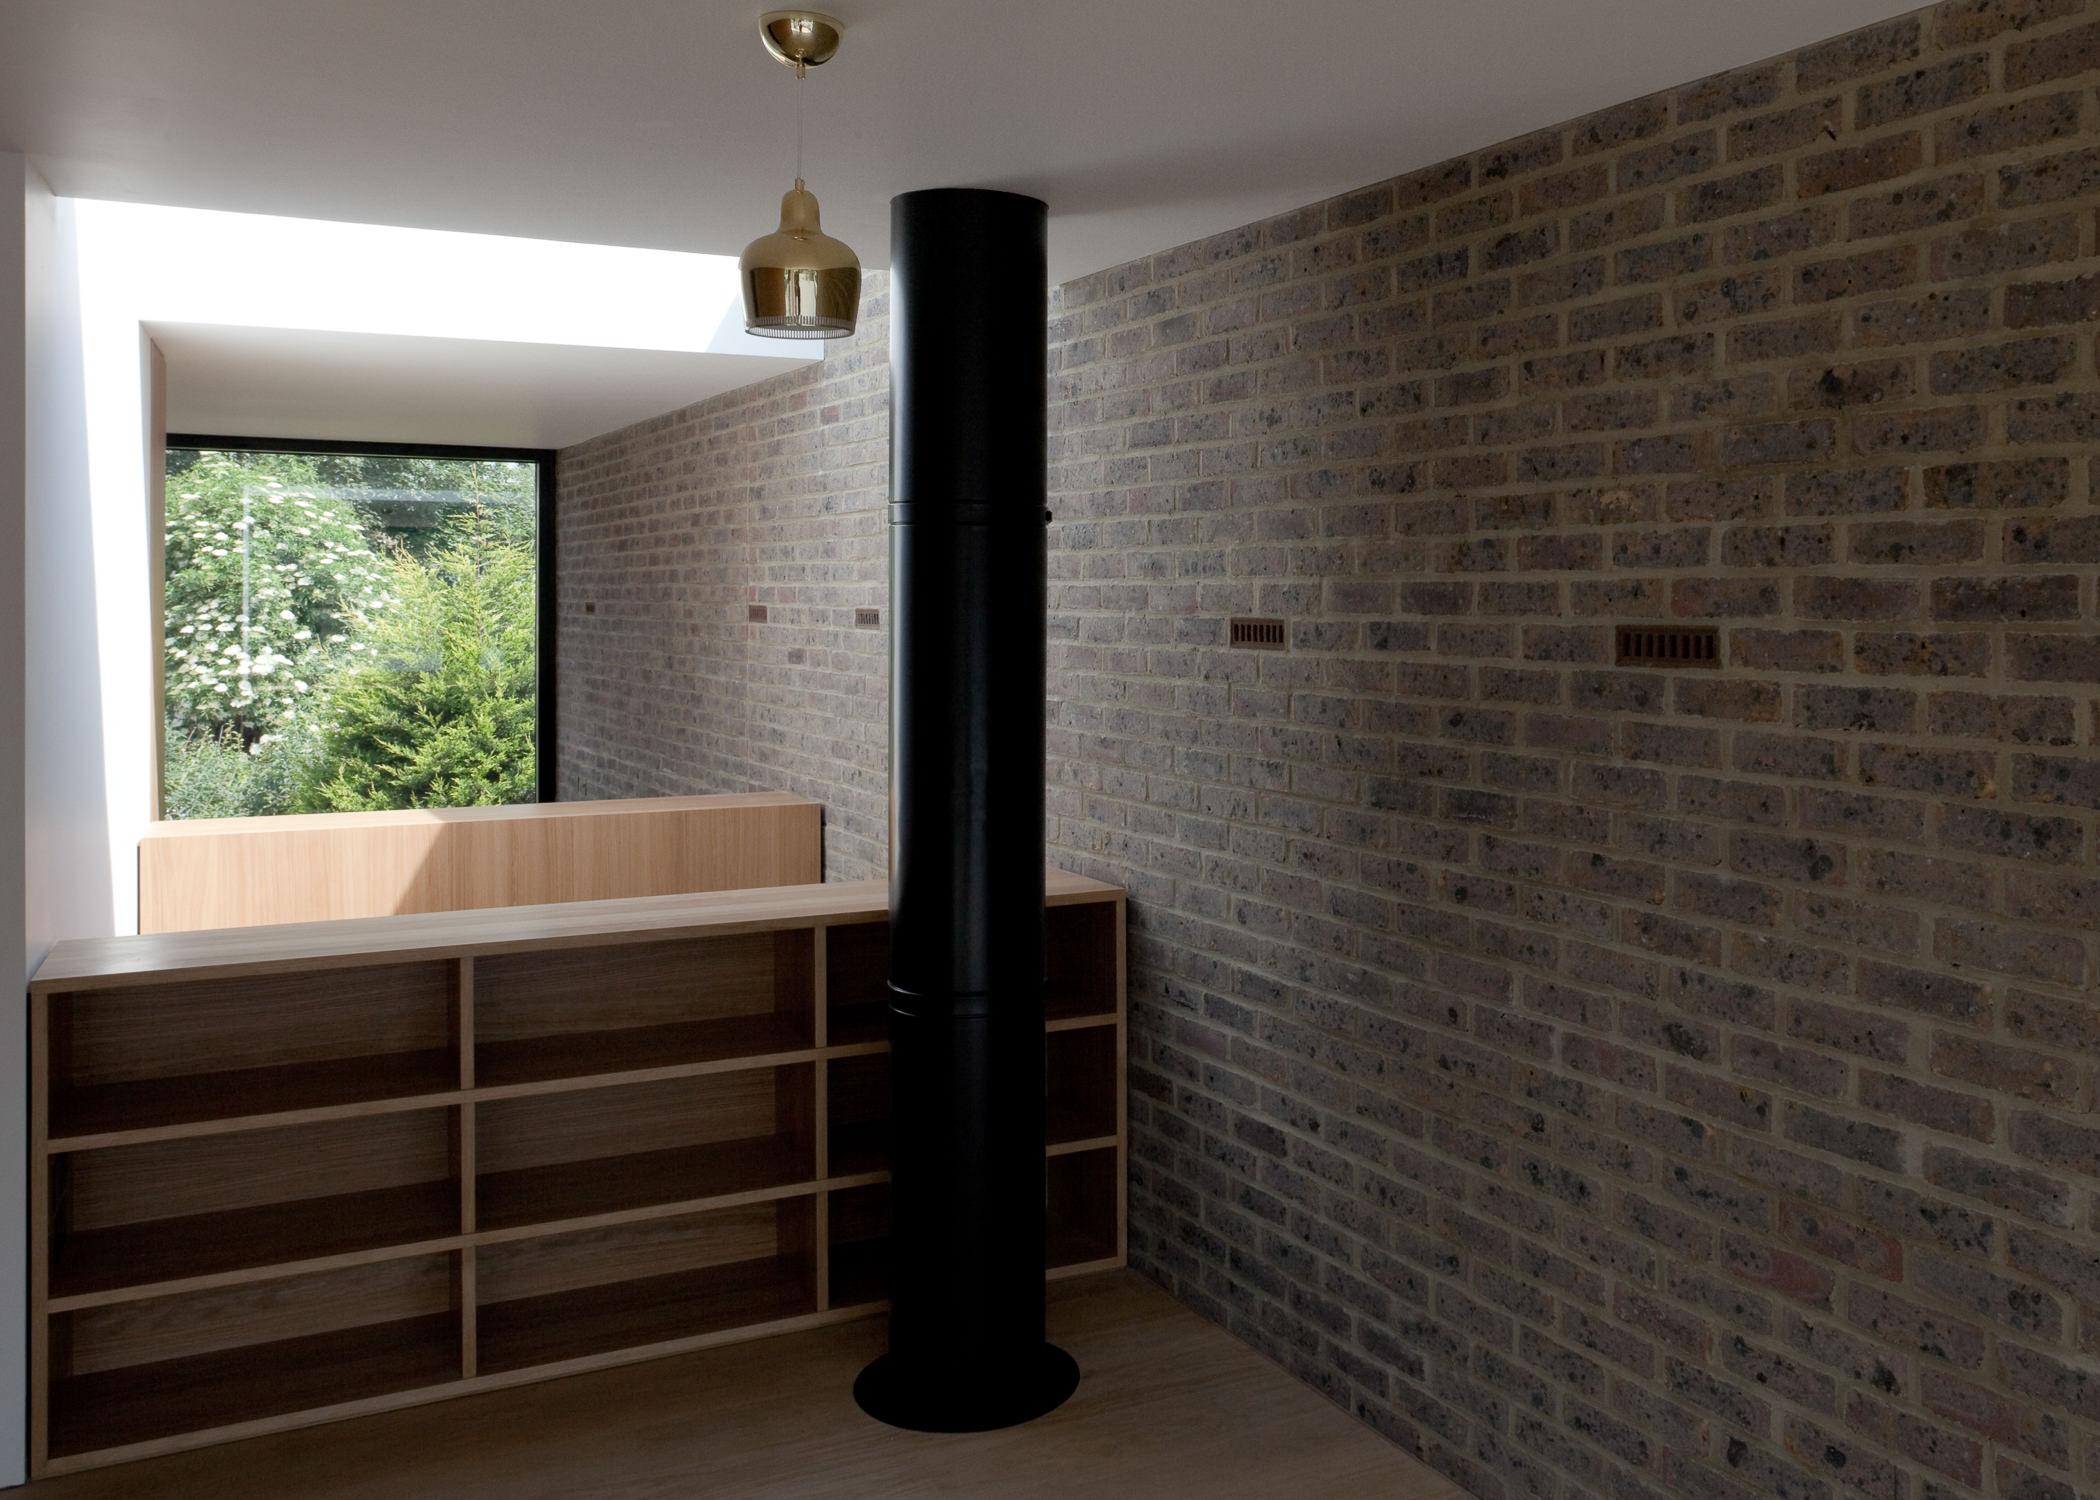 mark-hadden-architecture-photographer-architectuur-interieur-fotografie-london-amsterdam-Kings Avenue_© MH 04.jpg